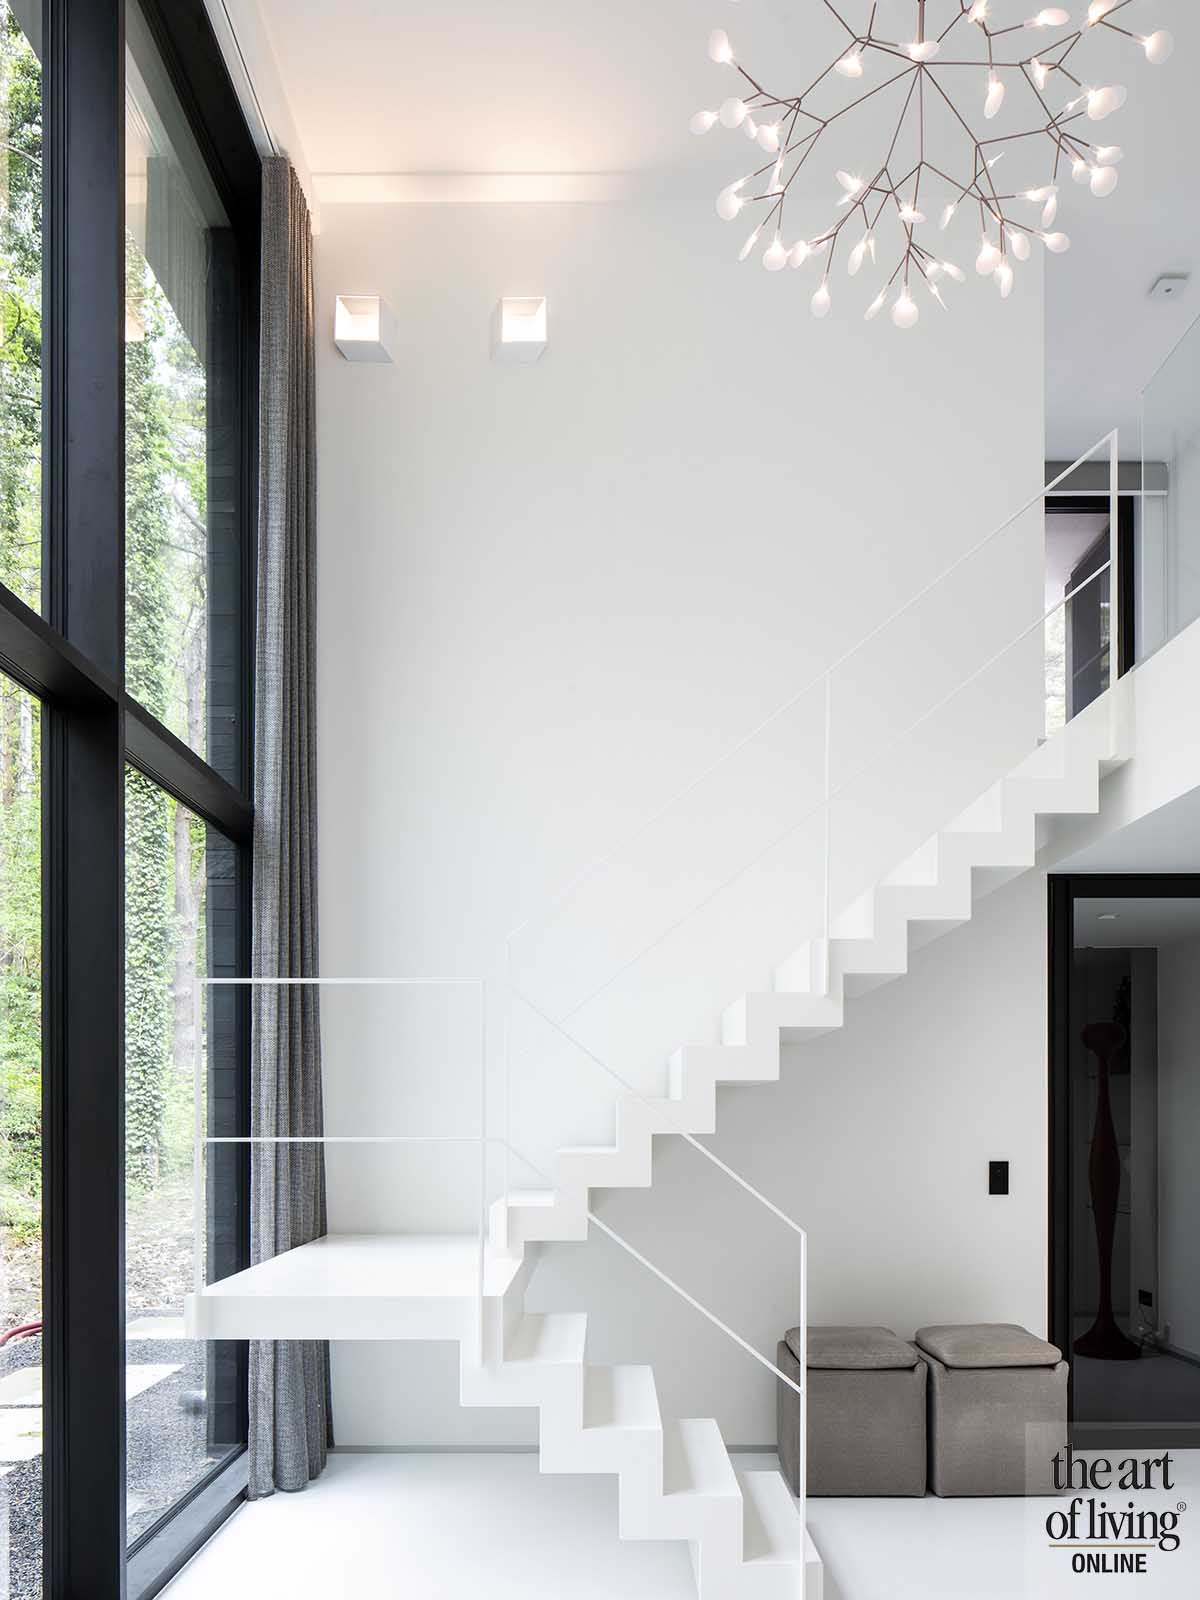 zwart wit interieur   Architectenbureau van Steenkiste, the art of living